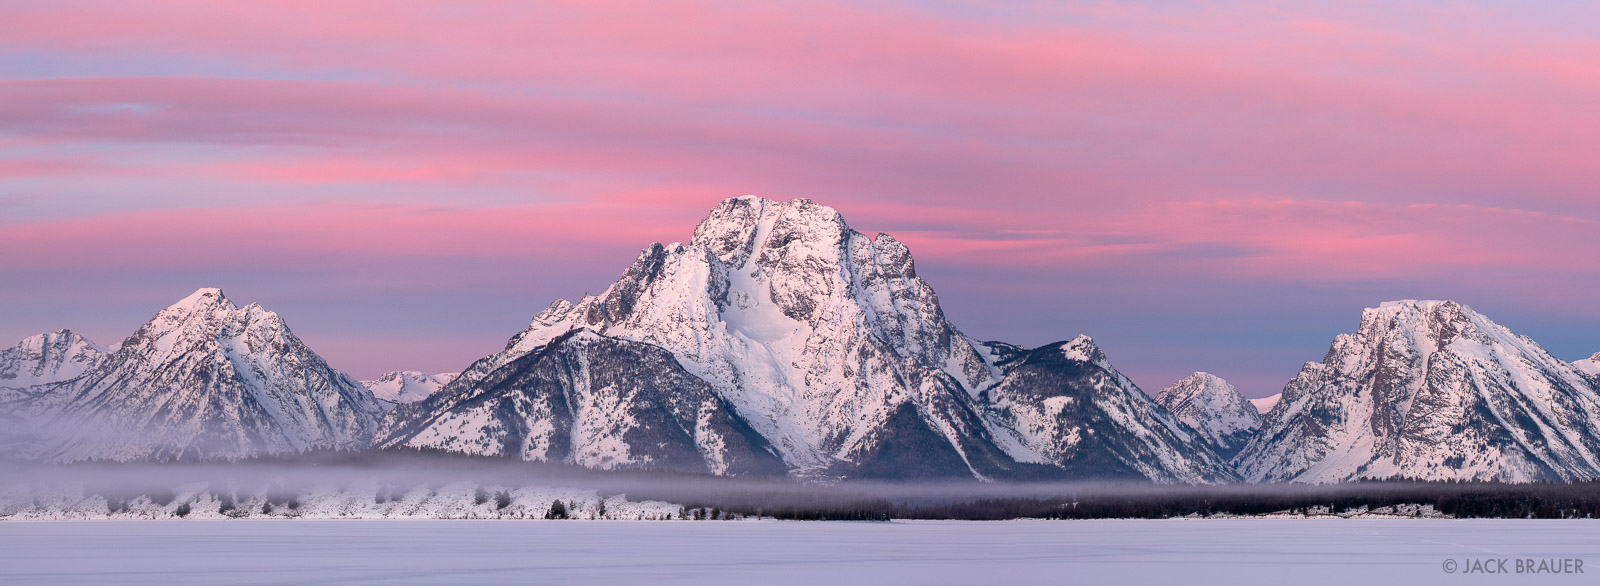 Jackson Lake, Tetons, Wyoming, panorama, Mt. Moran, Grand Teton National Park, photo